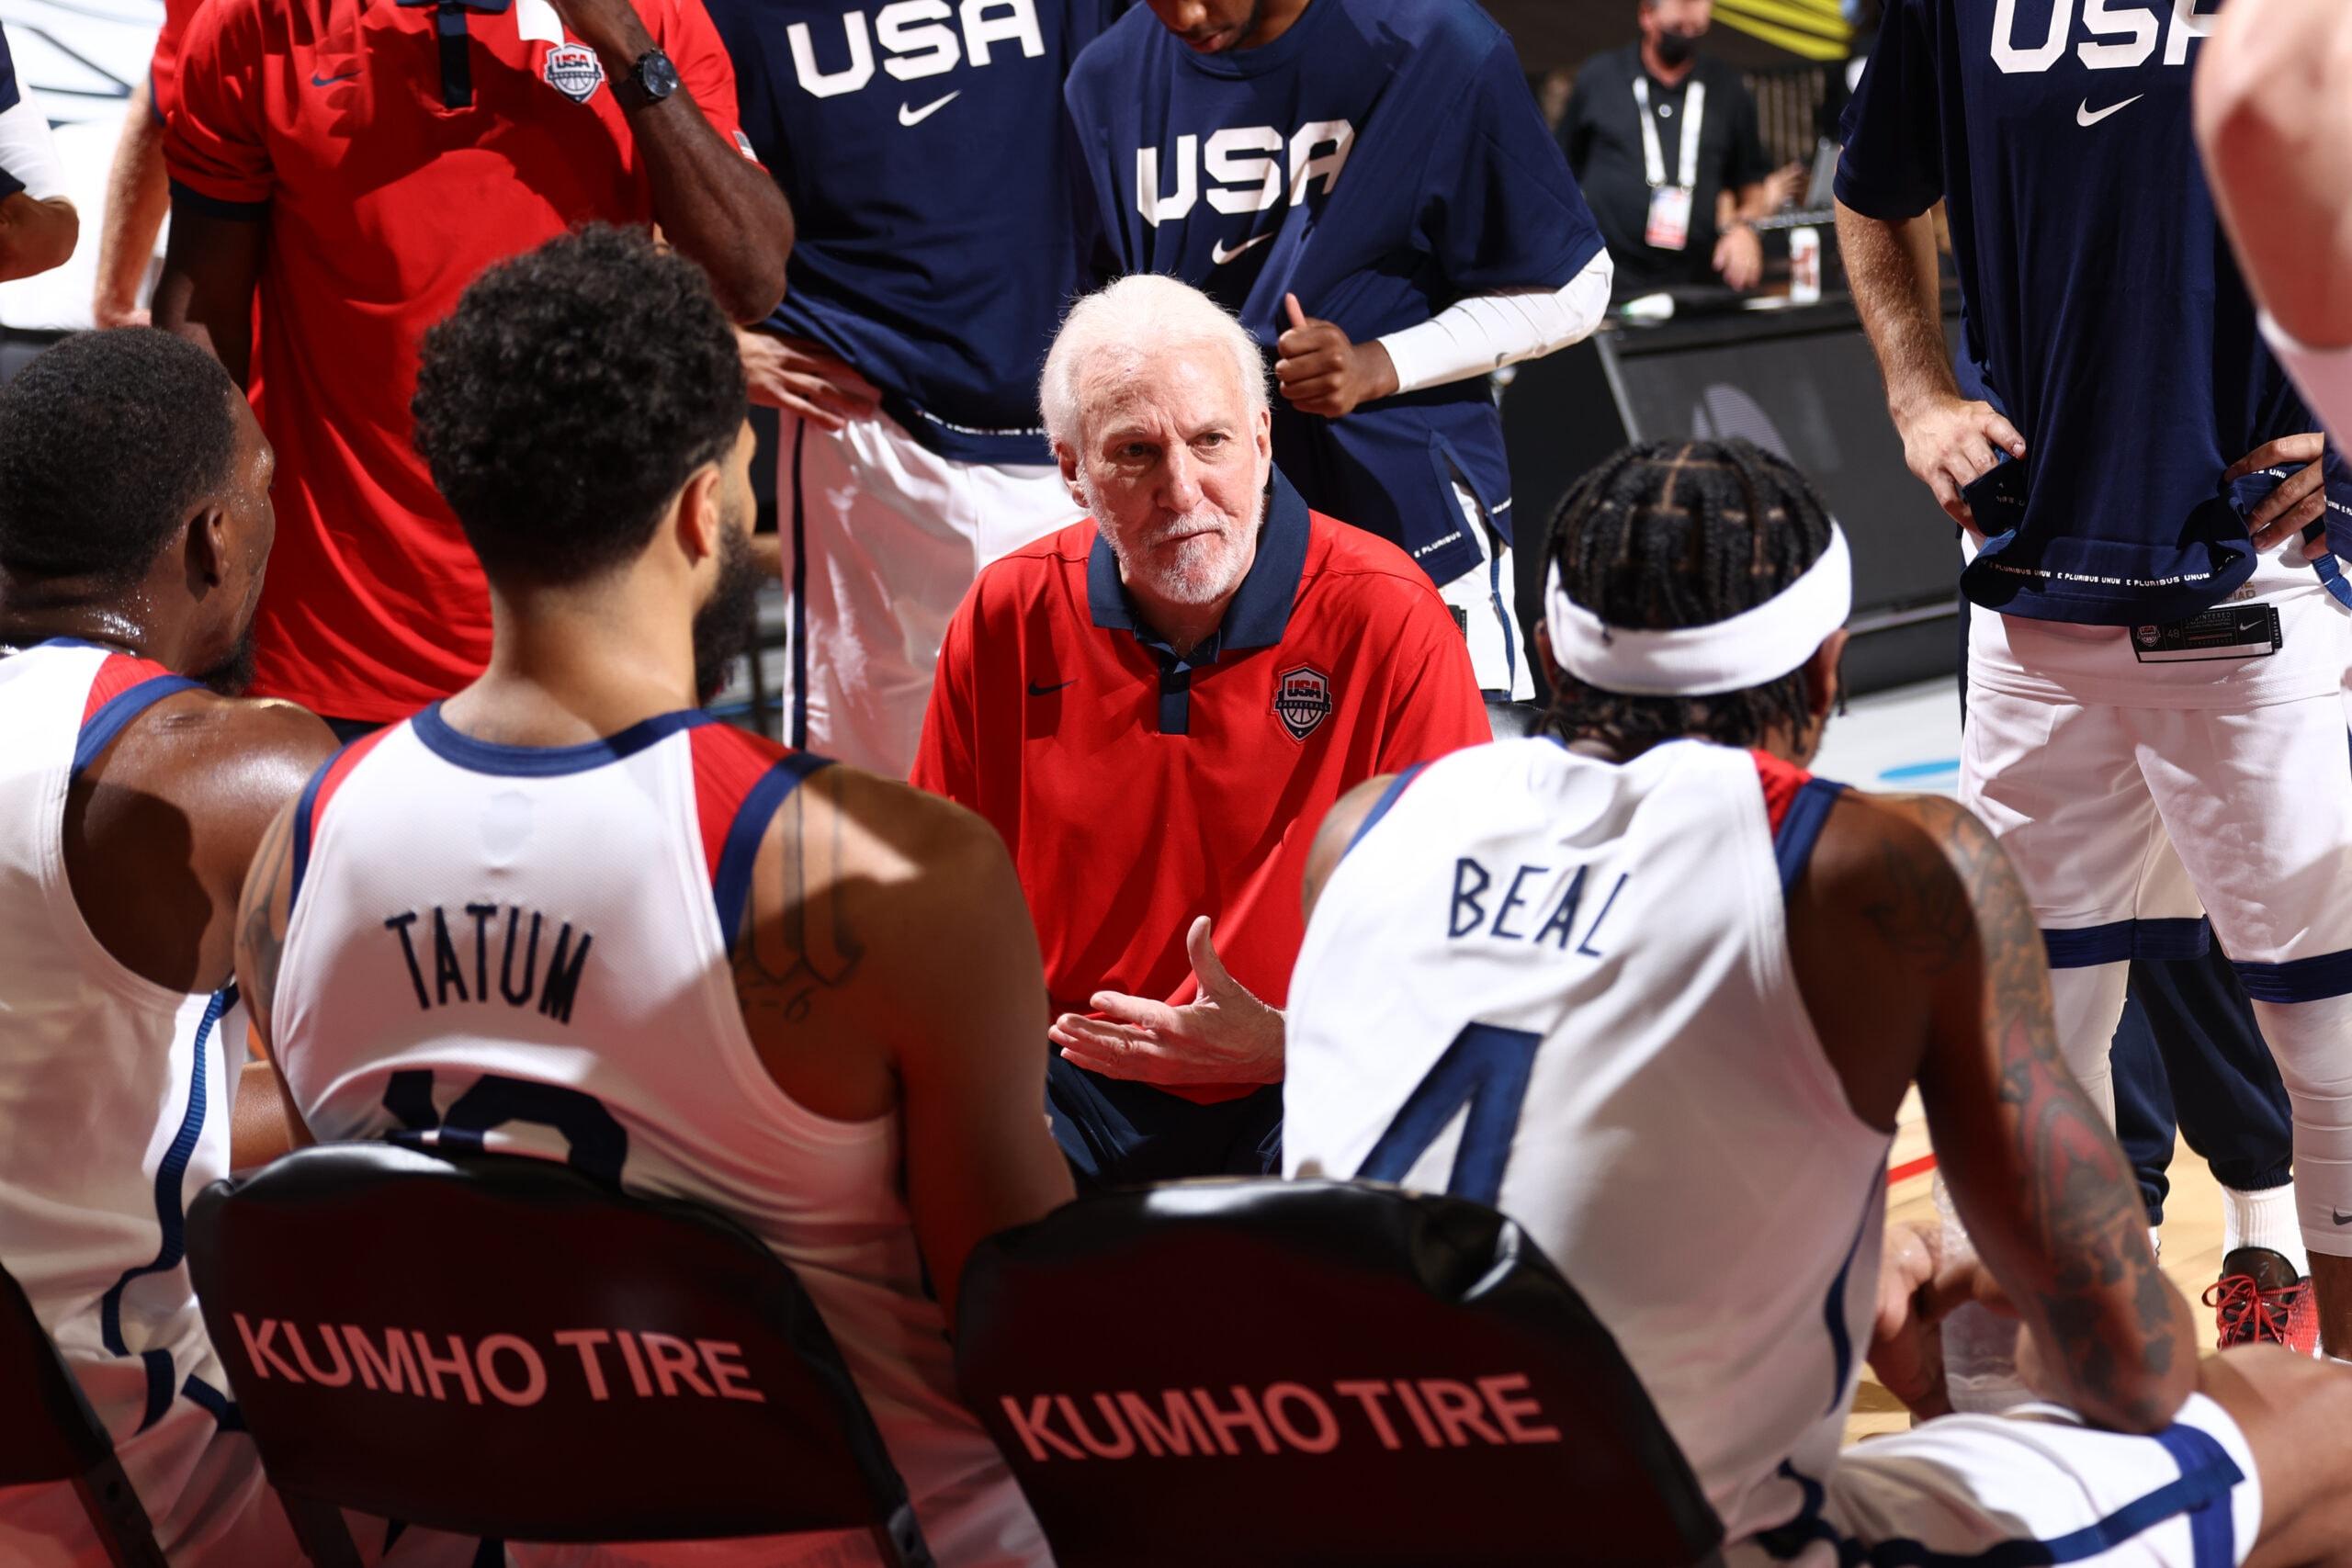 USA Basketball men's national team July 16 exhibition game vs. Australia  canceled   NBA.com